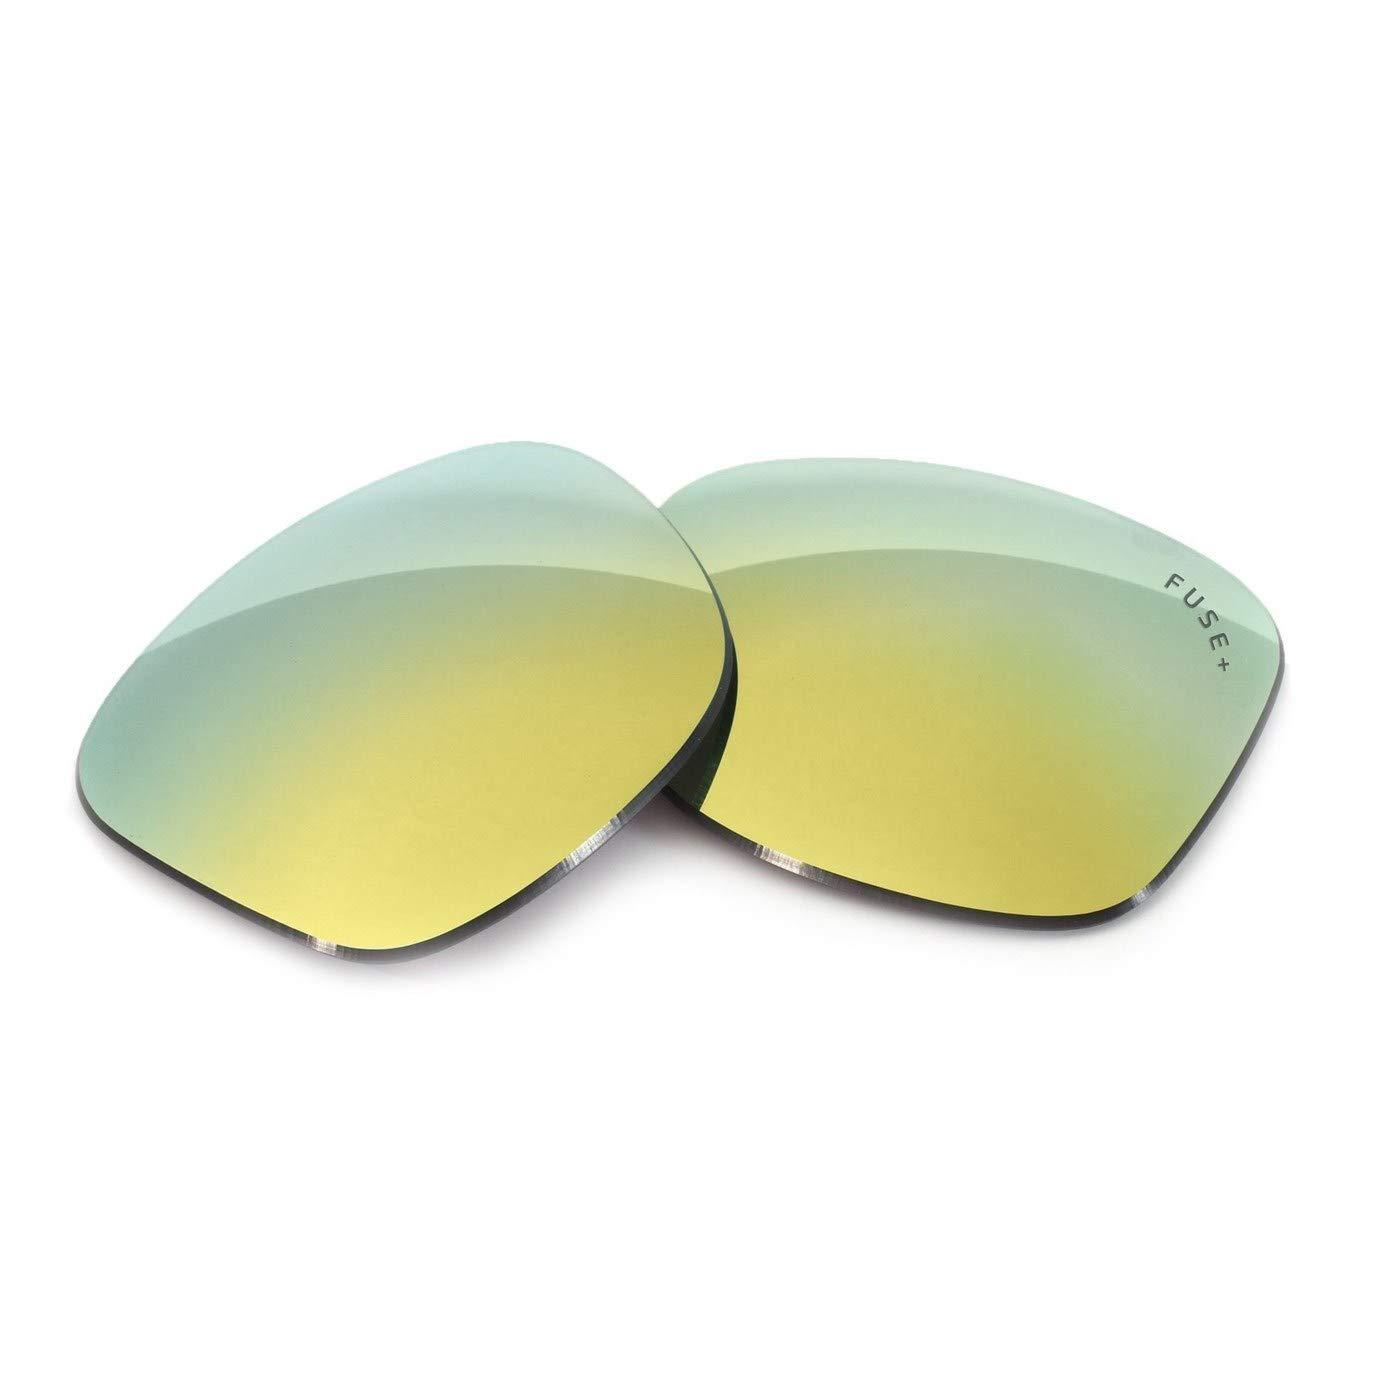 Plus Replacement Lenses for Persol 2967-S 55mm Fuse Lenses Fuse